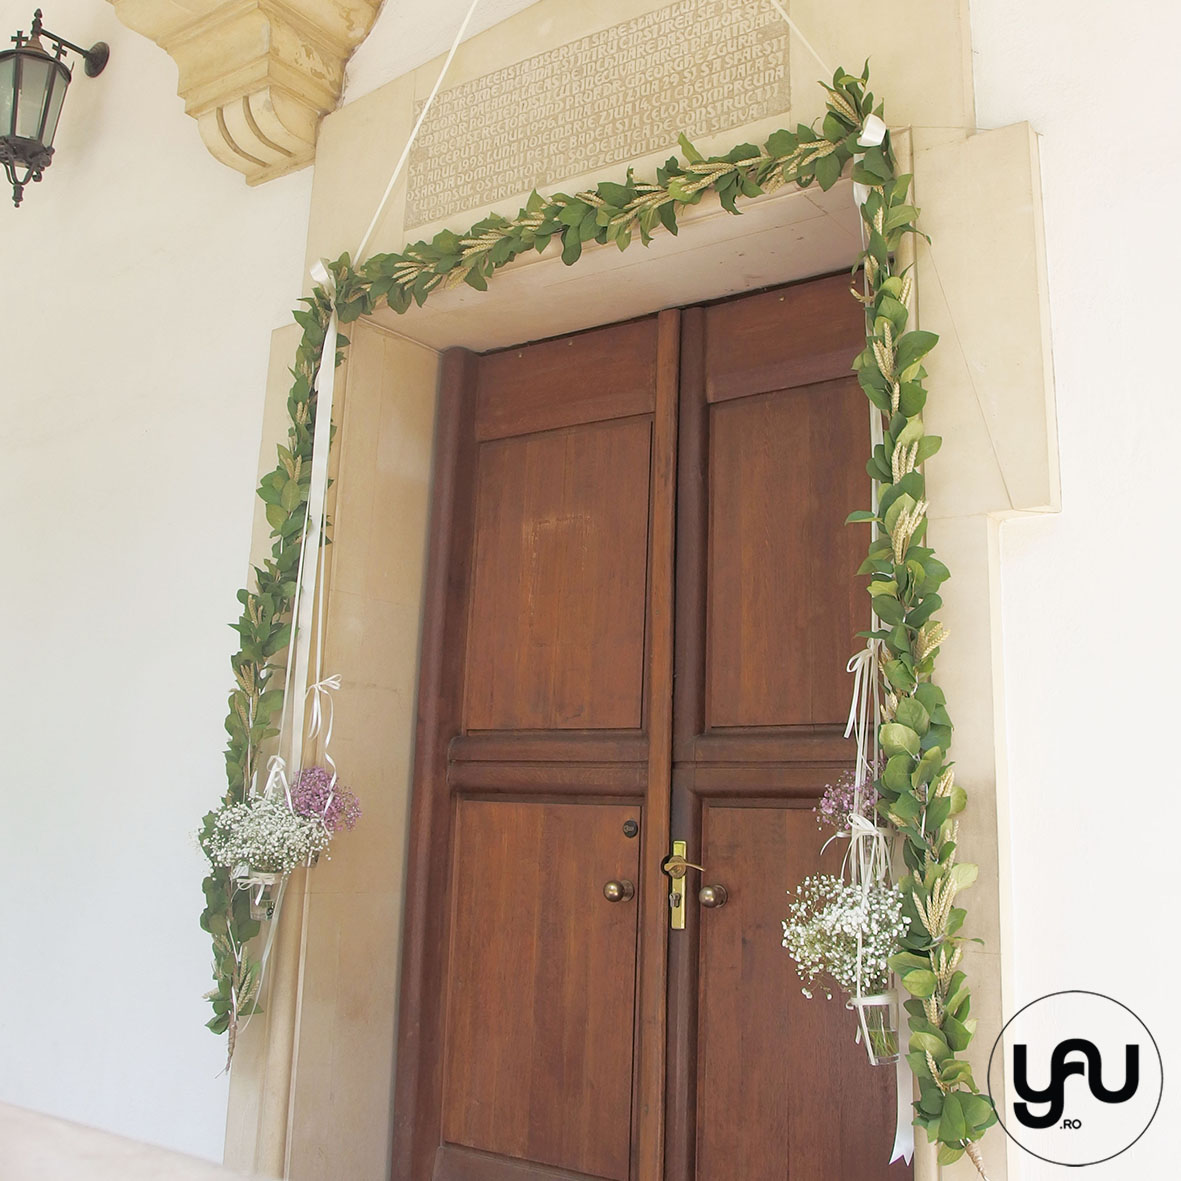 codrul-cu-flori-albe-bujori-mathiola-orhidee-_-yau-evenimente-2016-_-nunta-la-zexe-_-elenatoader-47